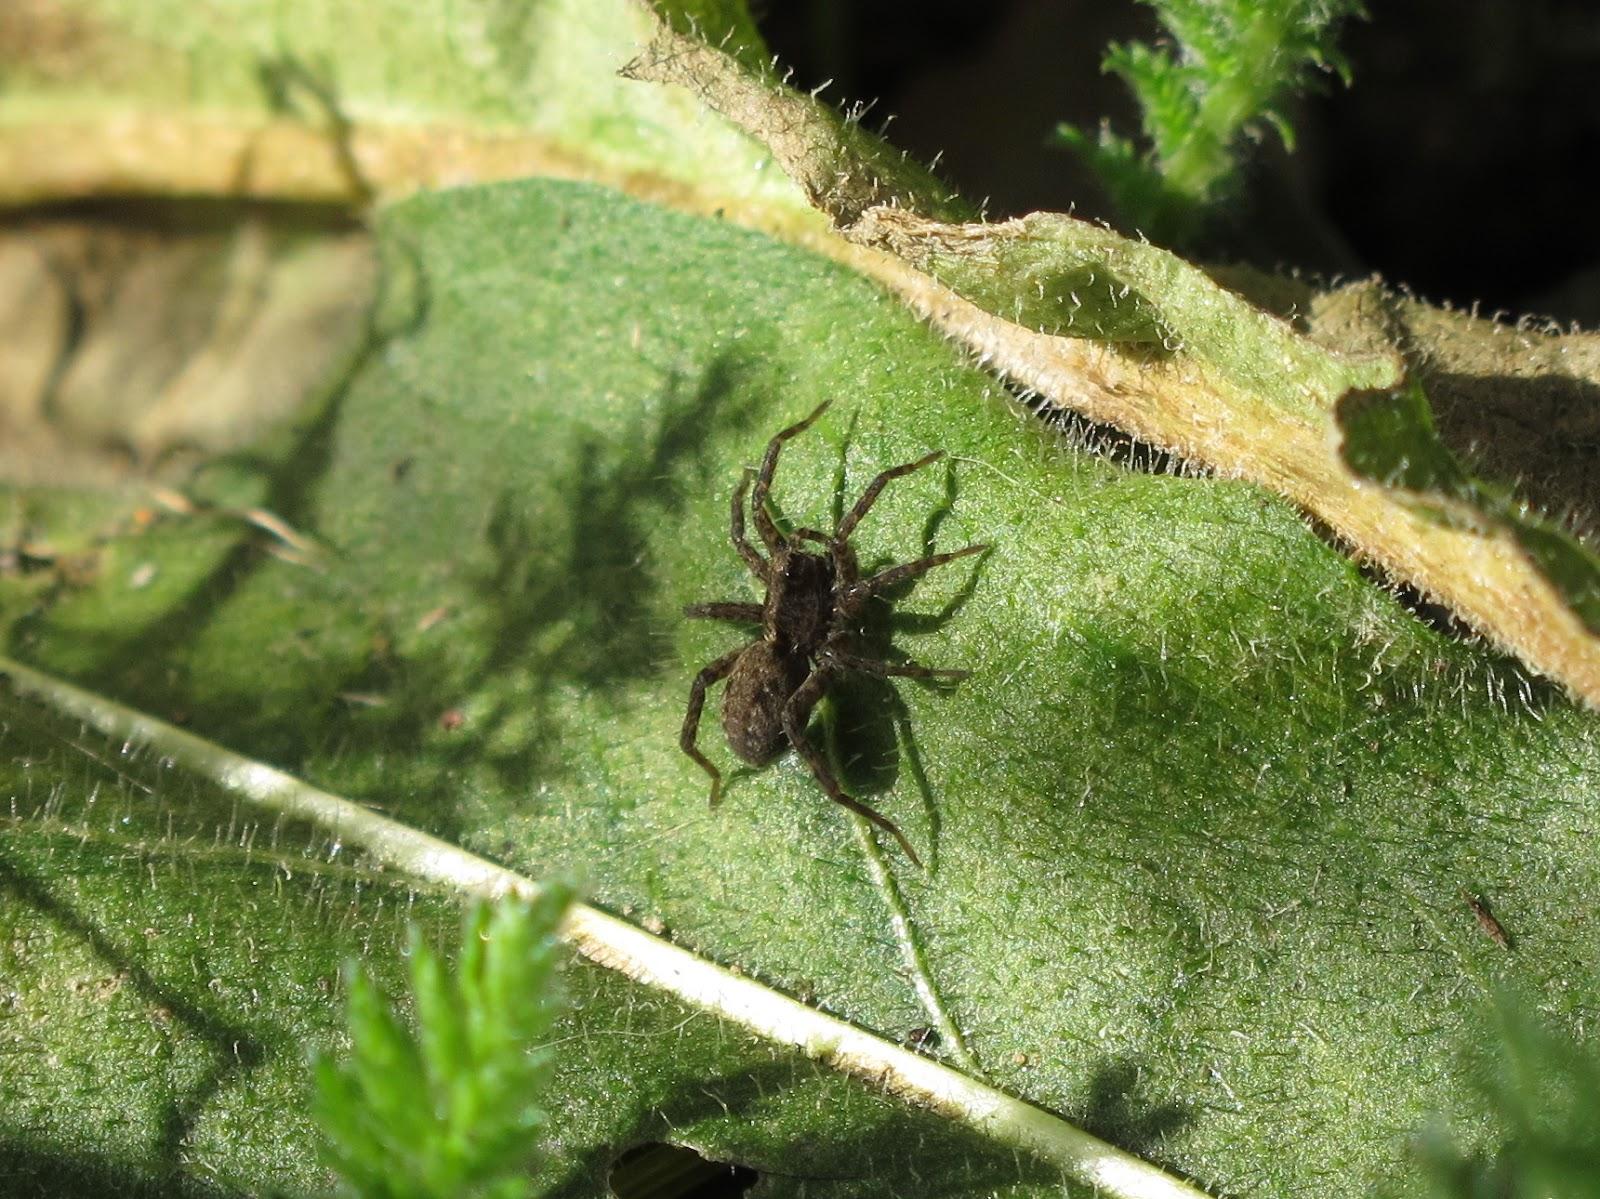 BugBlog: Sunbathing wolf spiders